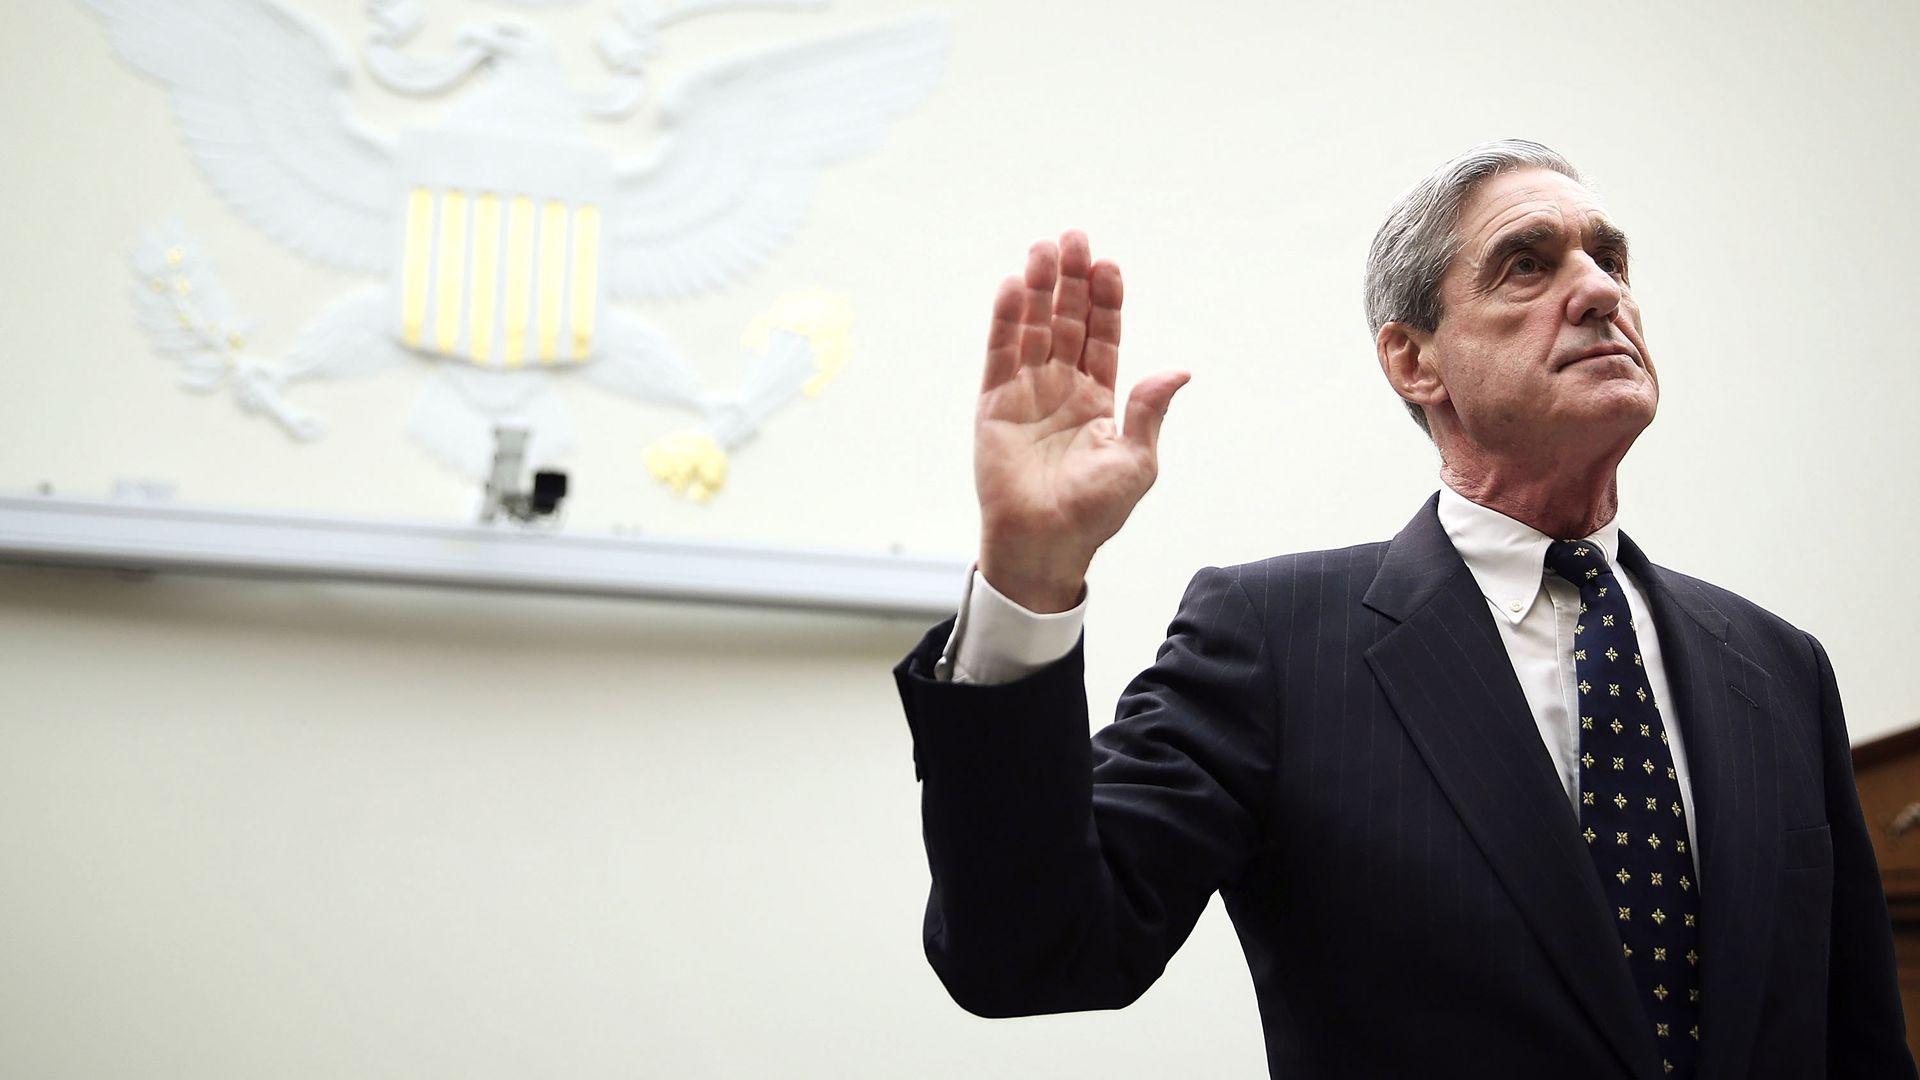 Bob Mueller raises hand.